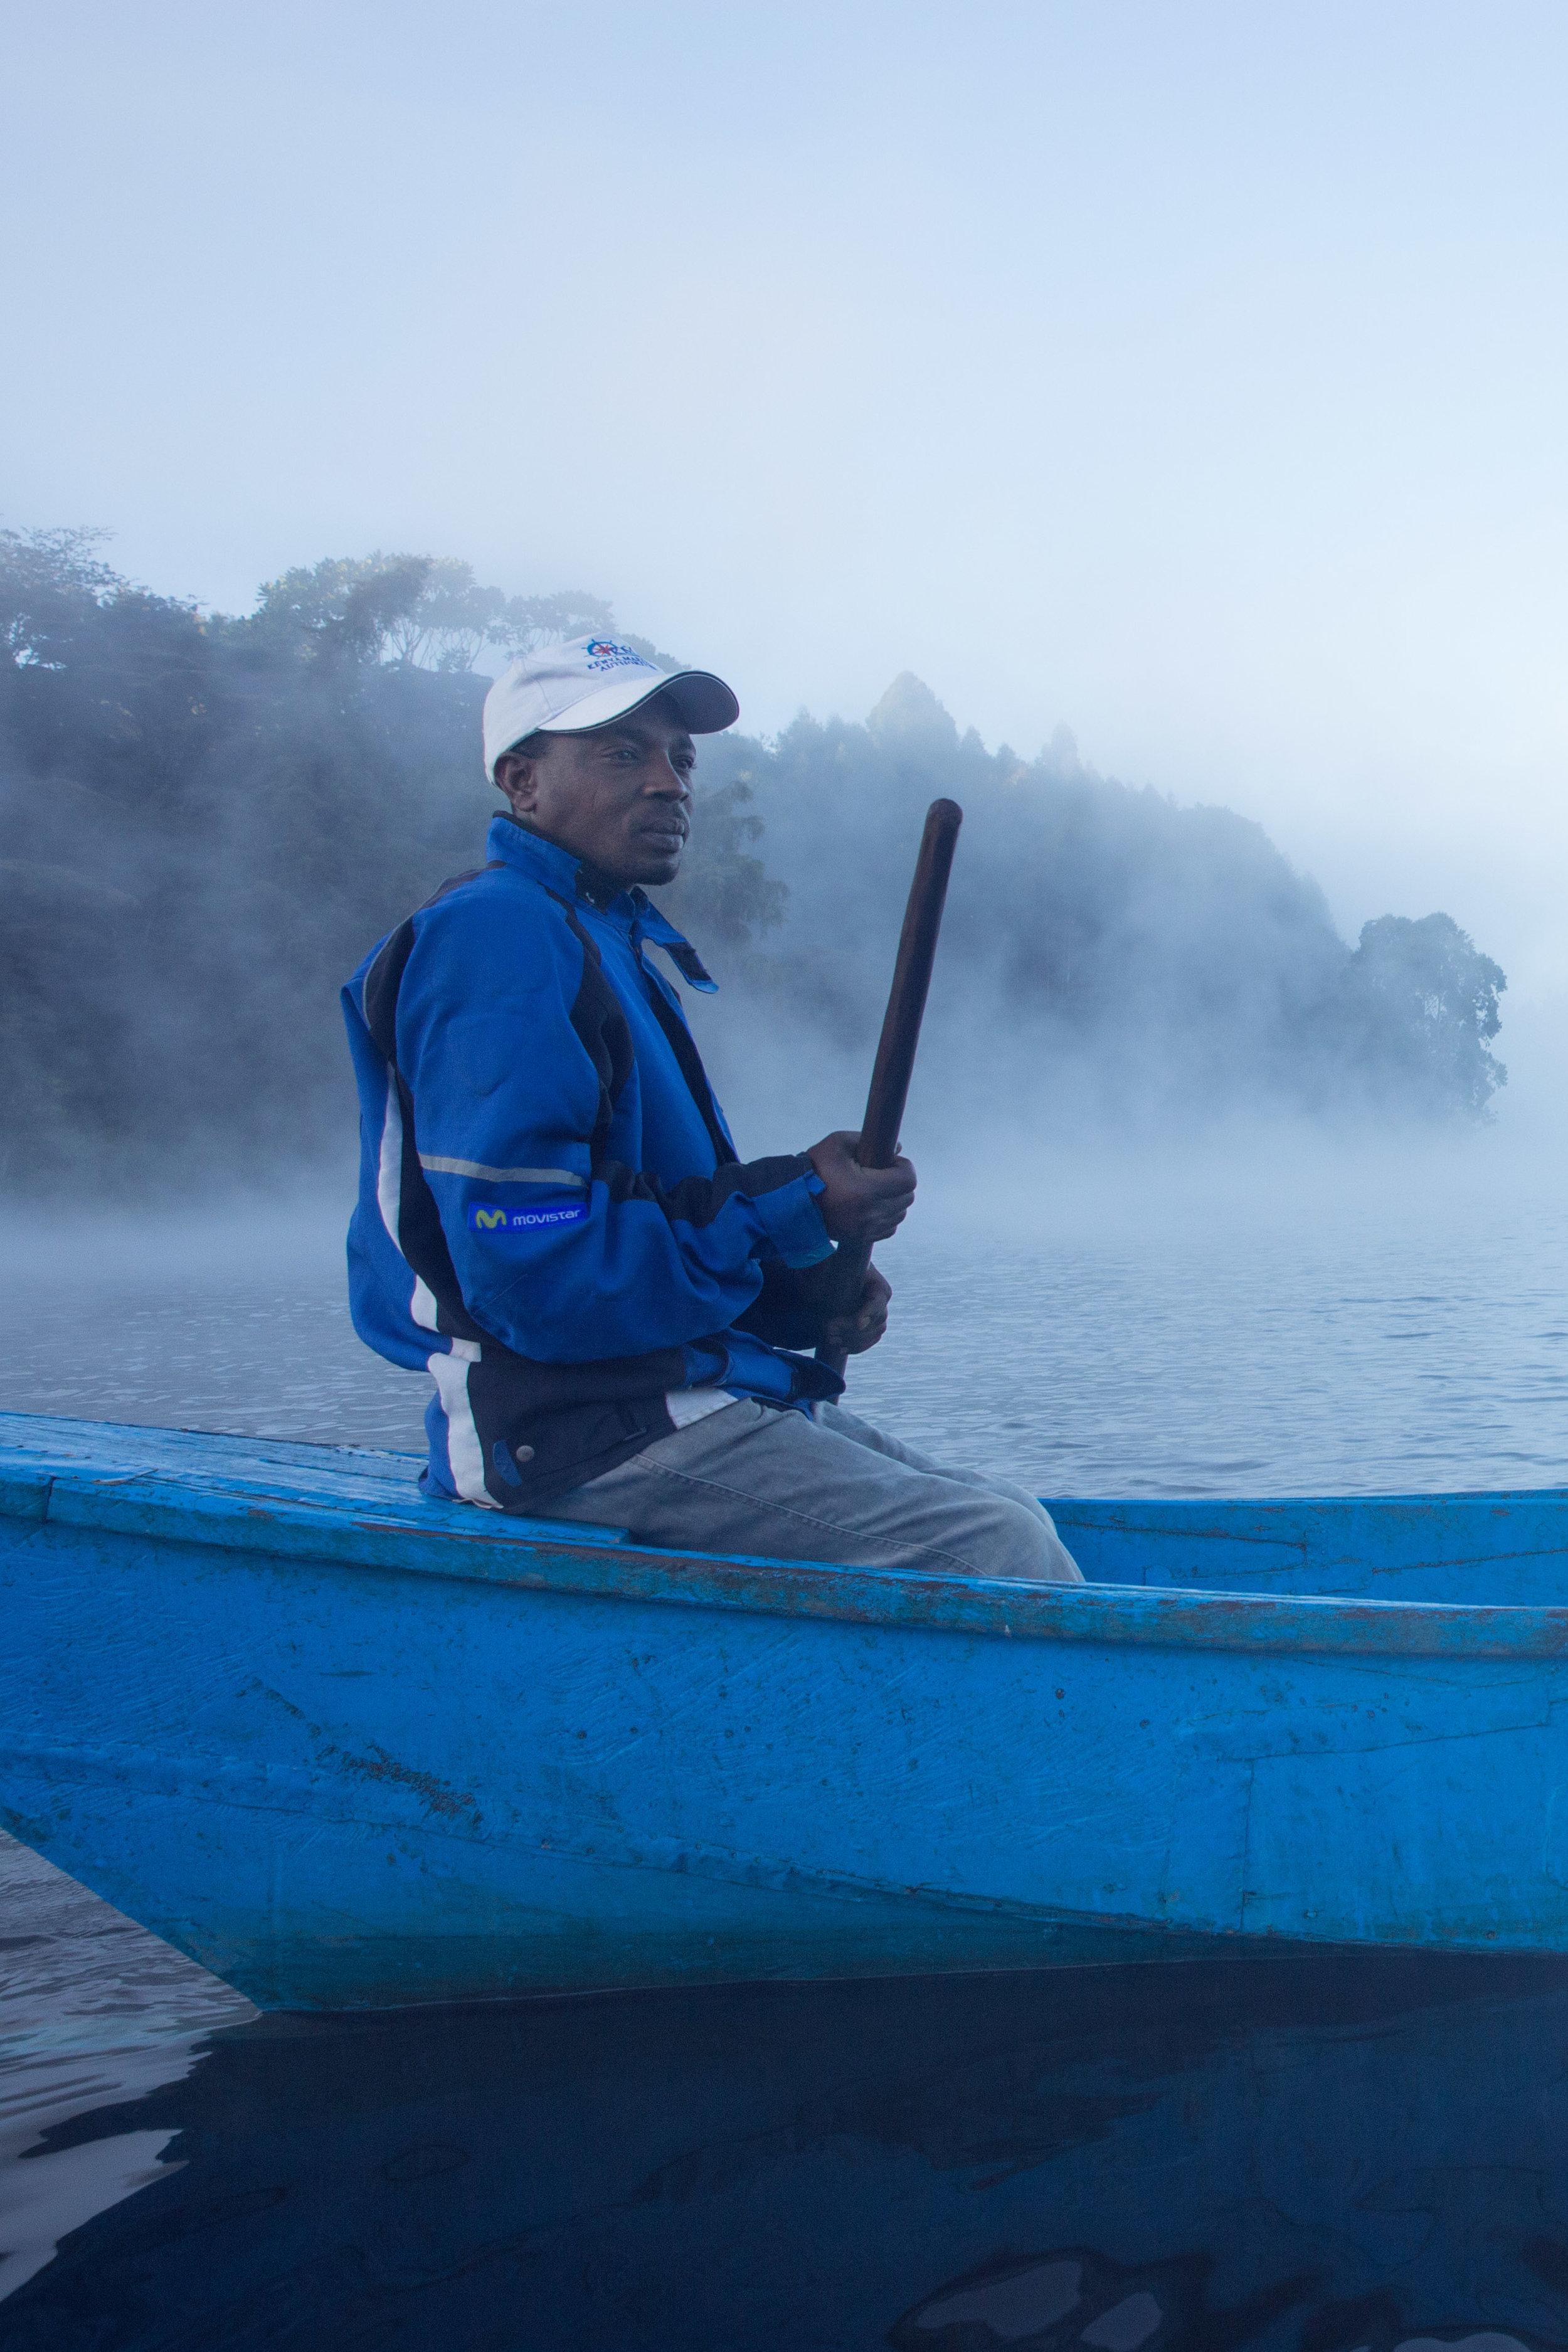 Mr. Mwangi, local fisherman